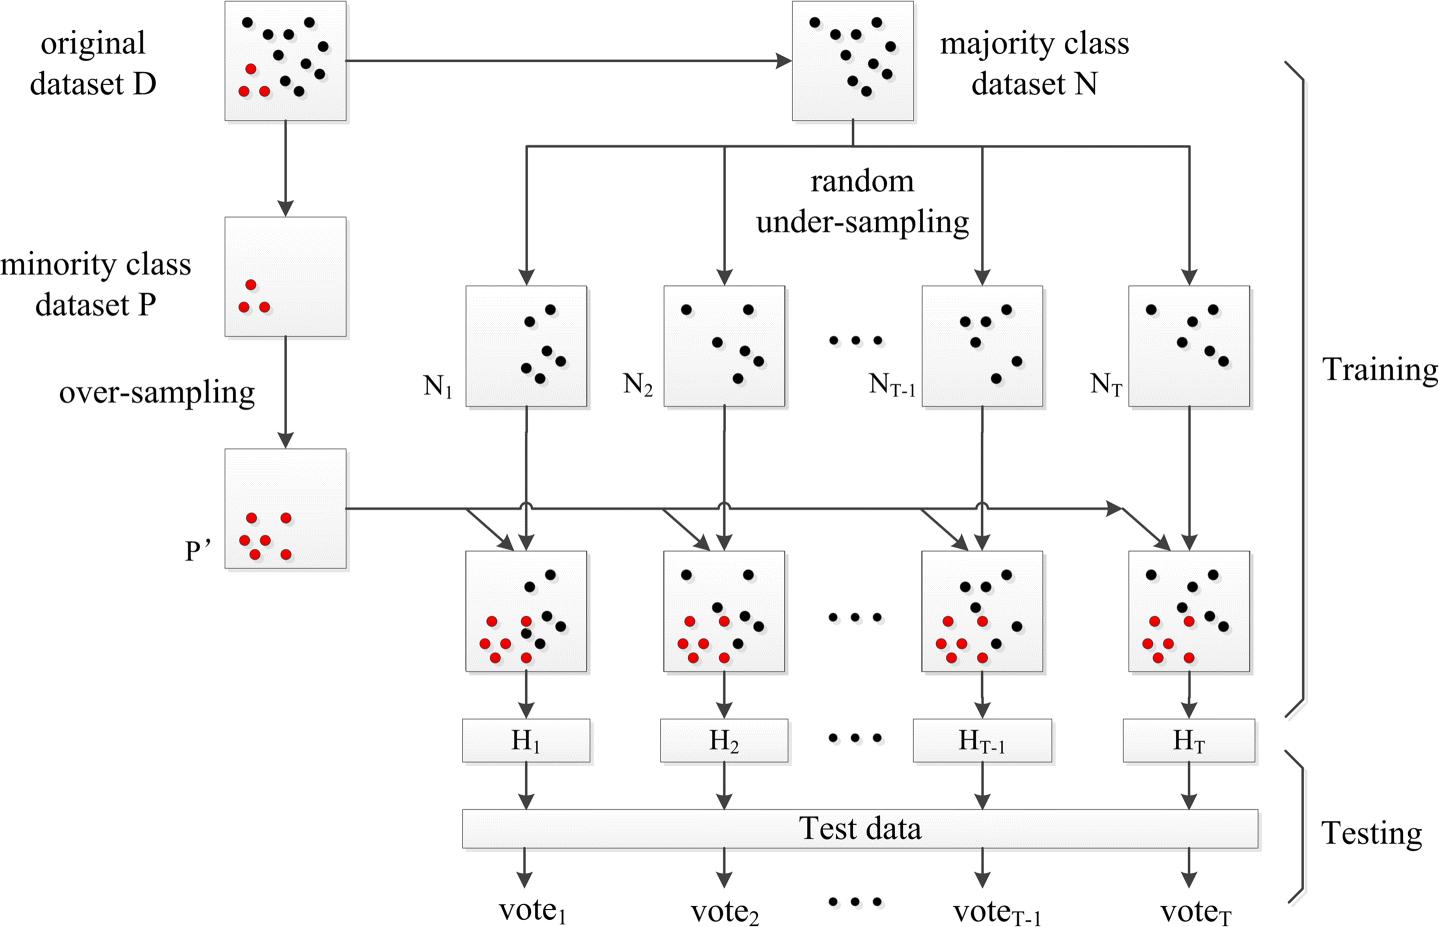 KA-Ensemble: towards imbalanced image classification